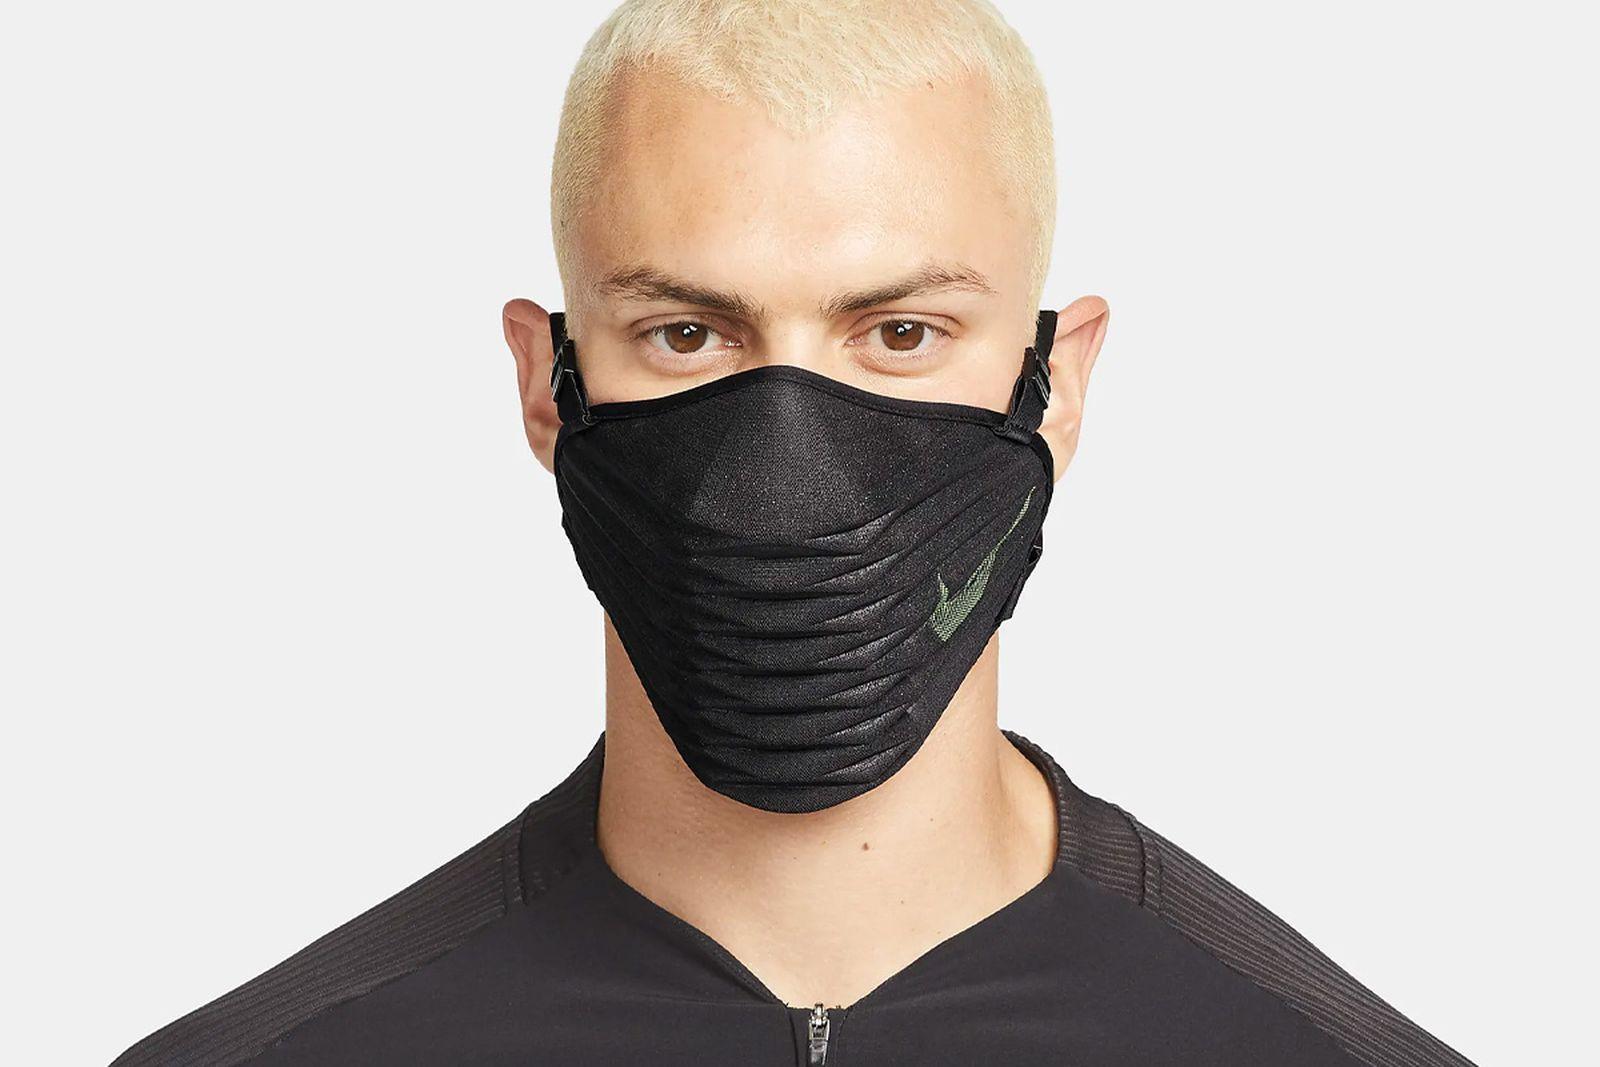 nike-performance-venturer-mask-olympics-main